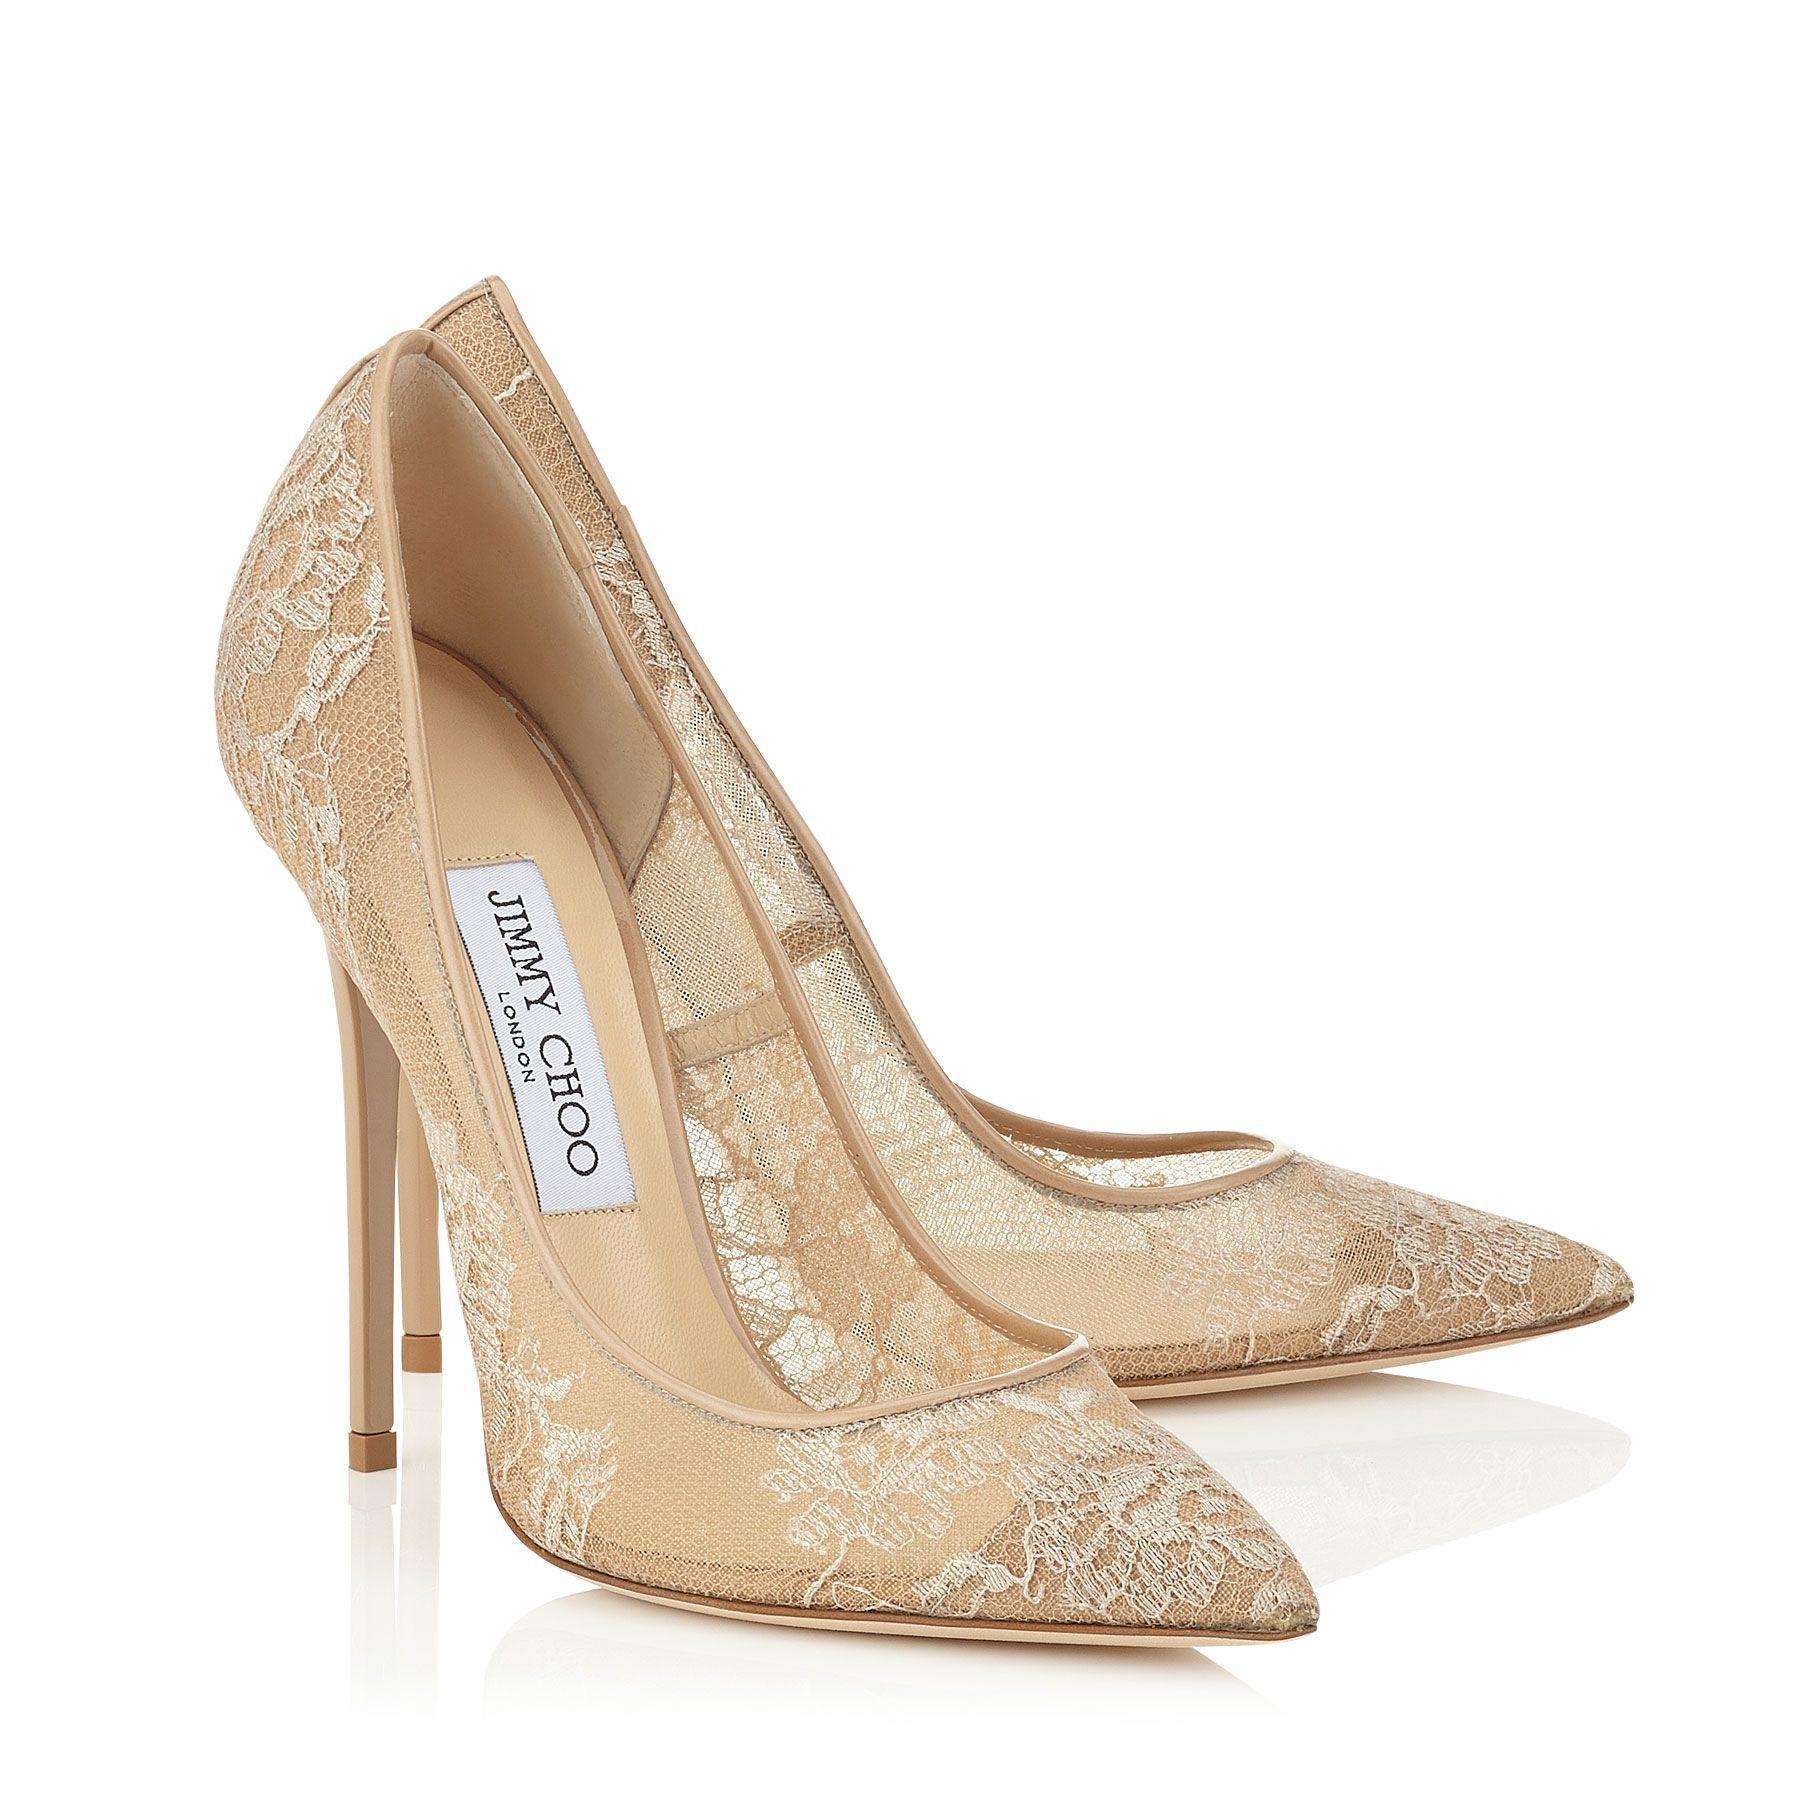 e0314421a Nude Lace Pointy Toe Pumps   Anouk   Pre Fall 15   JIMMY CHOO Shoes ...